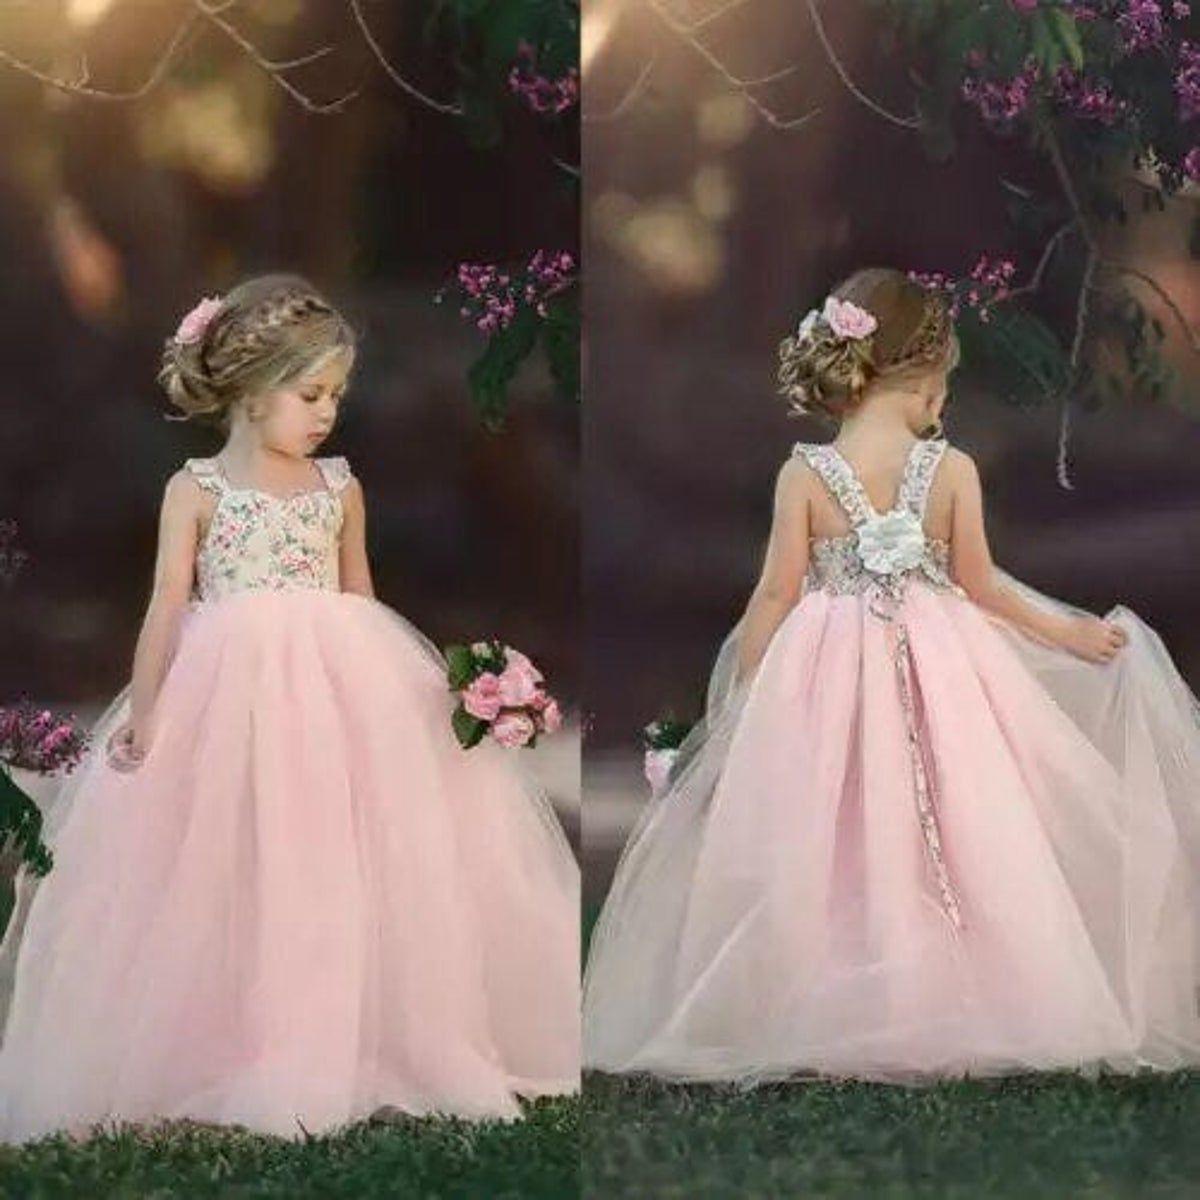 5t Princess Wedding Birthday Party Dress Princess Flower Girl Dresses Flower Girl Dresses Tulle Flower Girl Dress Lace [ 1200 x 1200 Pixel ]